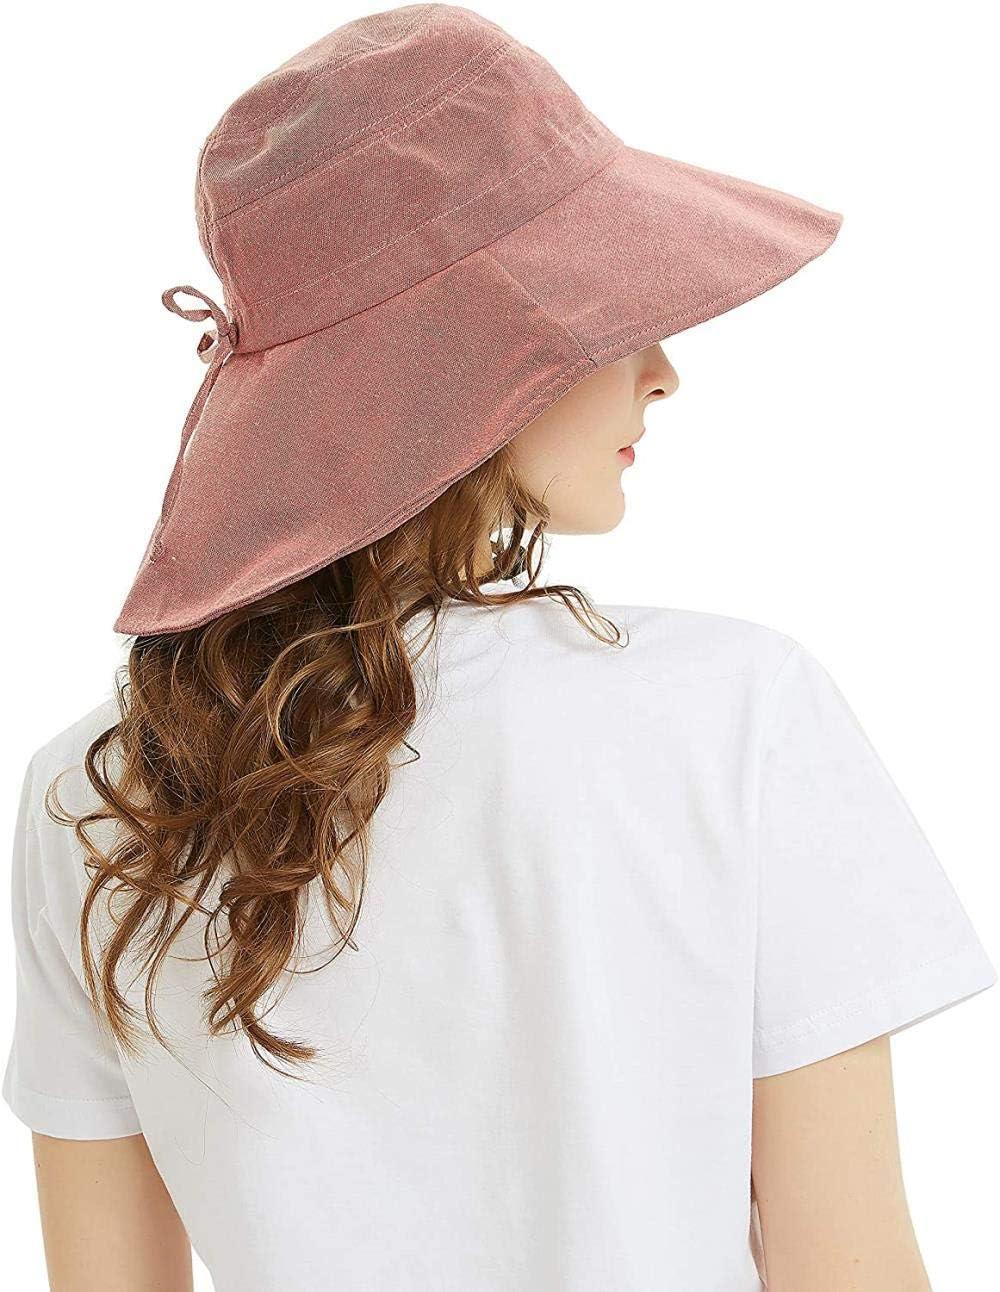 DBN Womens Sun Hat Foldable UV Protection Fishing Hat Wide Brim Safari Bucket Hat 101/_grey